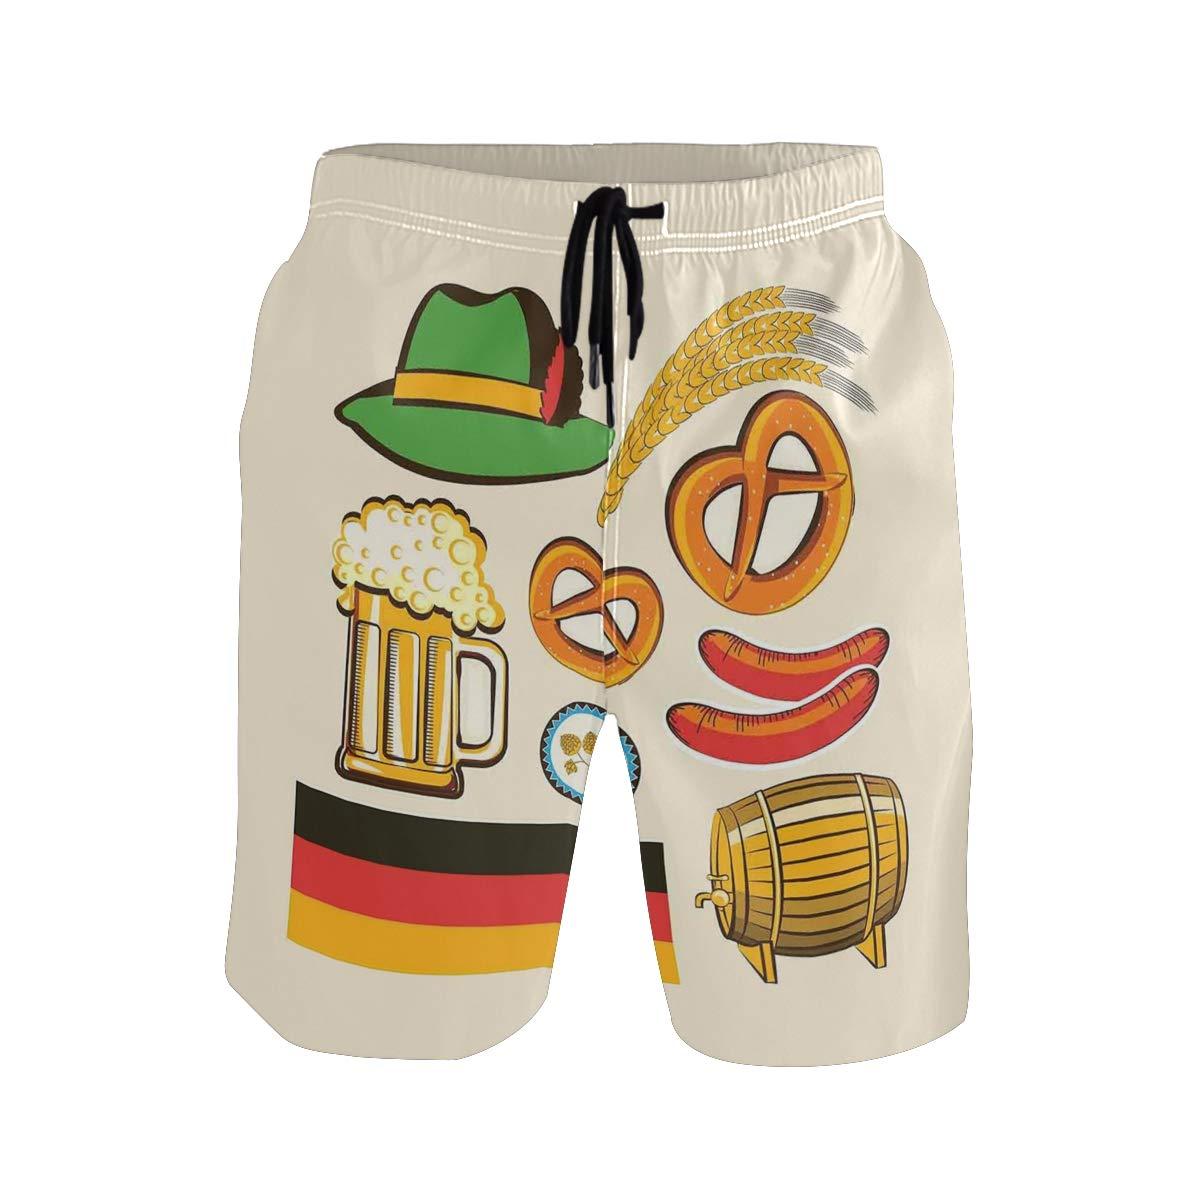 KVMV Oktoberfest Symbols Wheat Sausage Beer and Pretzels Colorful Bavarian Arran Casual Swim Trunks All